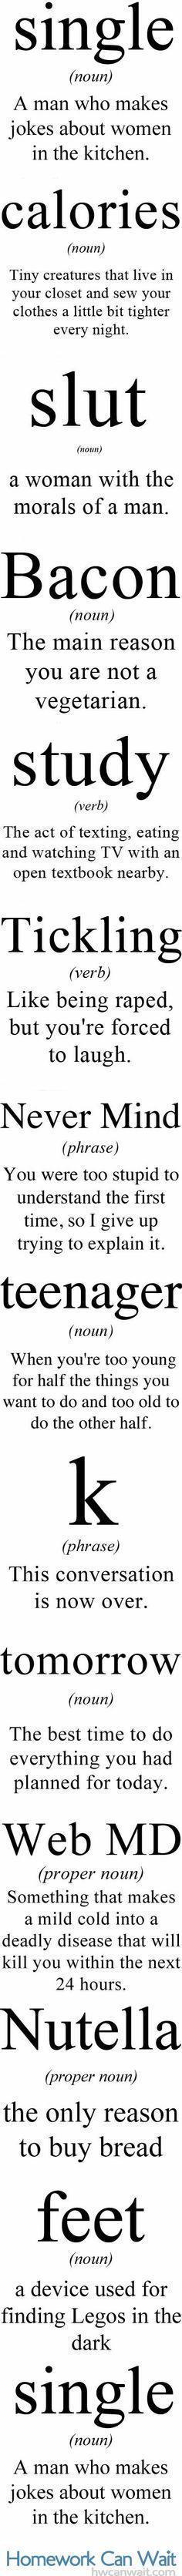 Pretty much true...